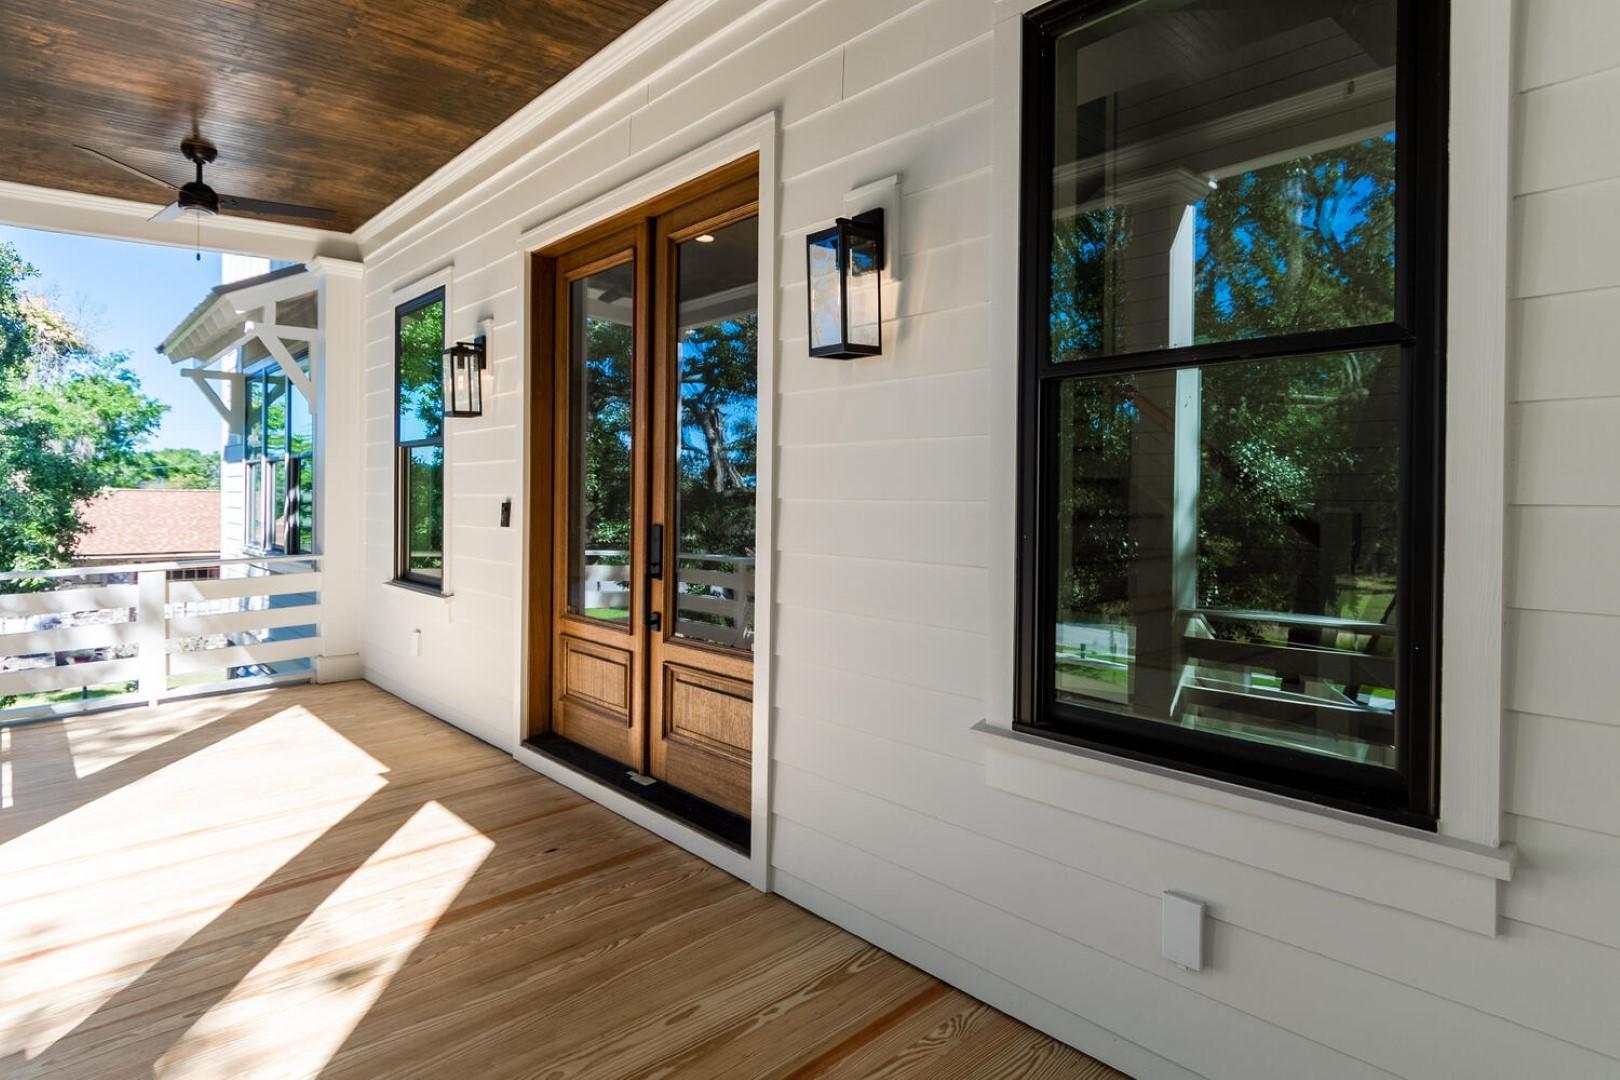 Scanlonville Homes For Sale - 156 5th, Mount Pleasant, SC - 18